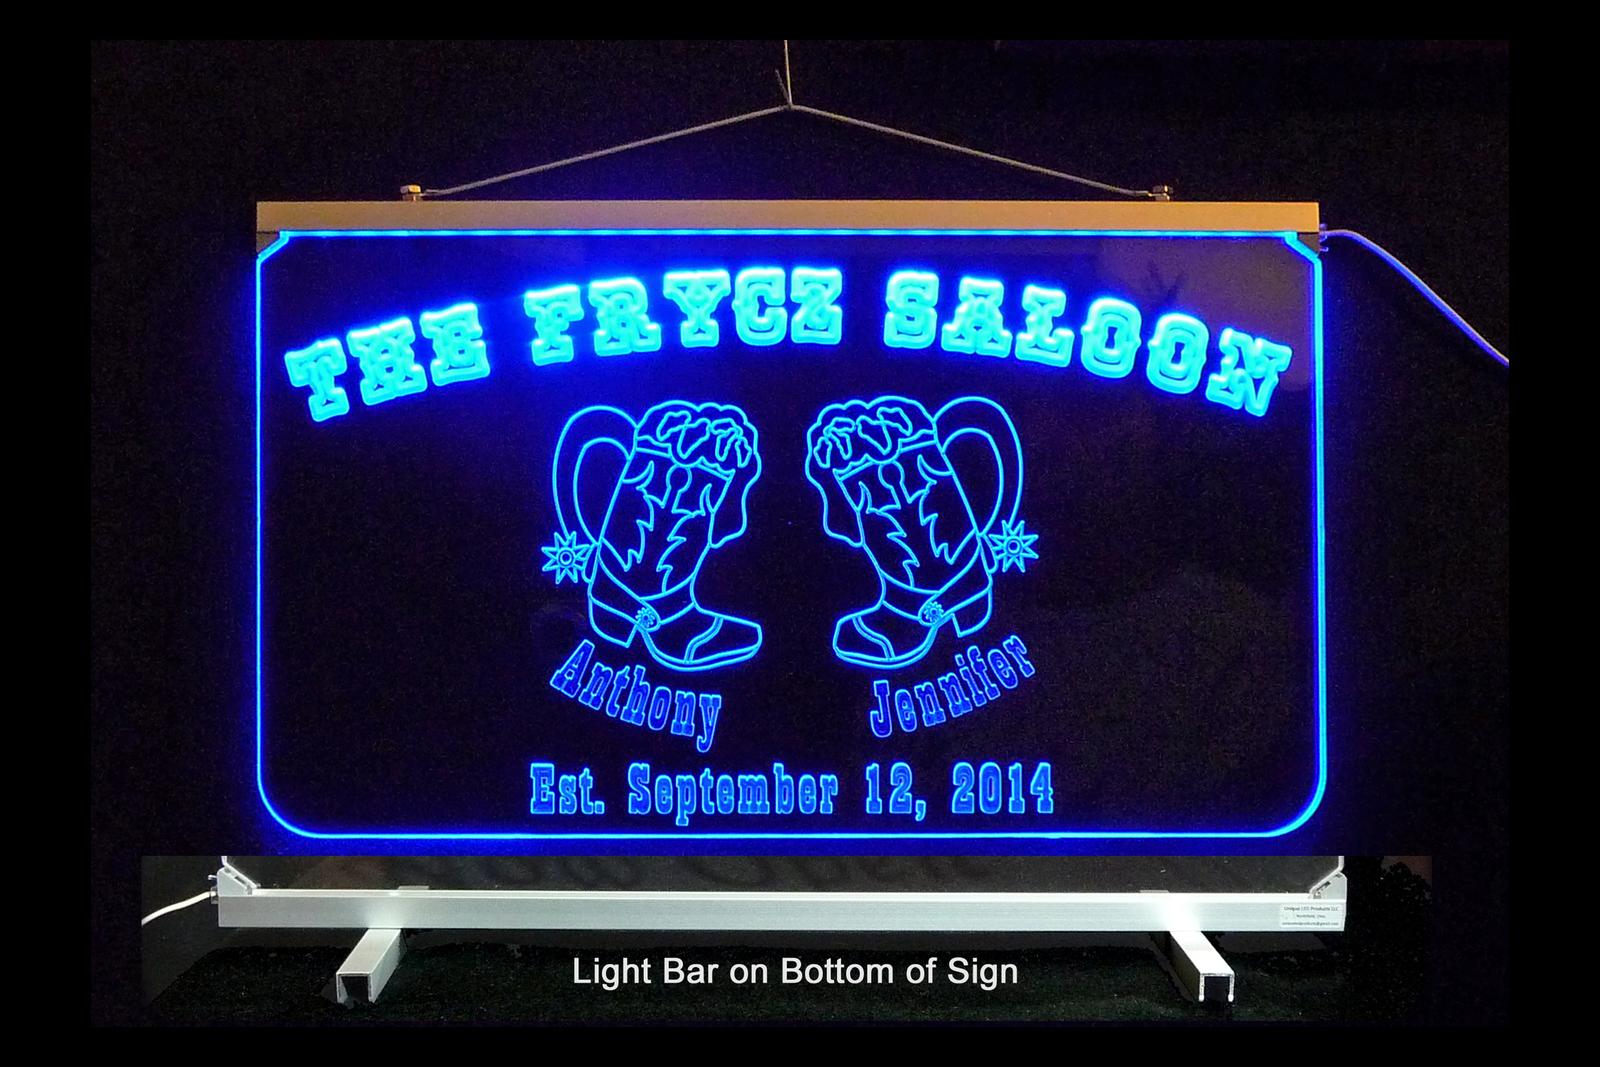 Frycz saloongood blue bottom light bar